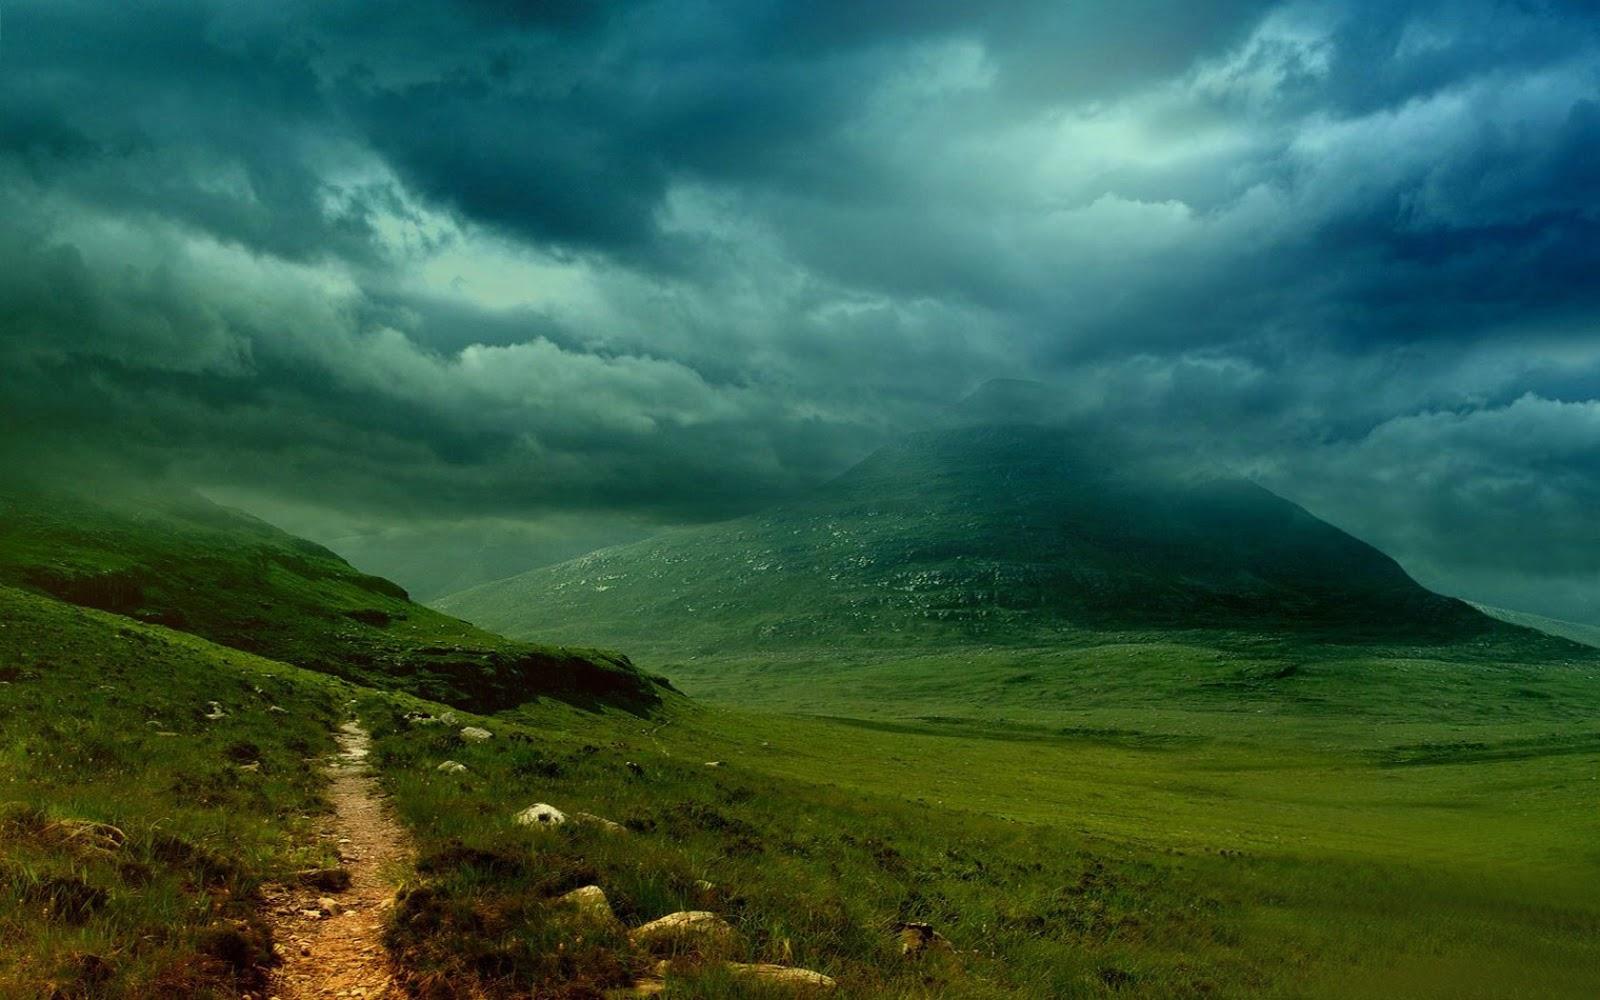 cloudy mountain phone wallpaper - photo #36